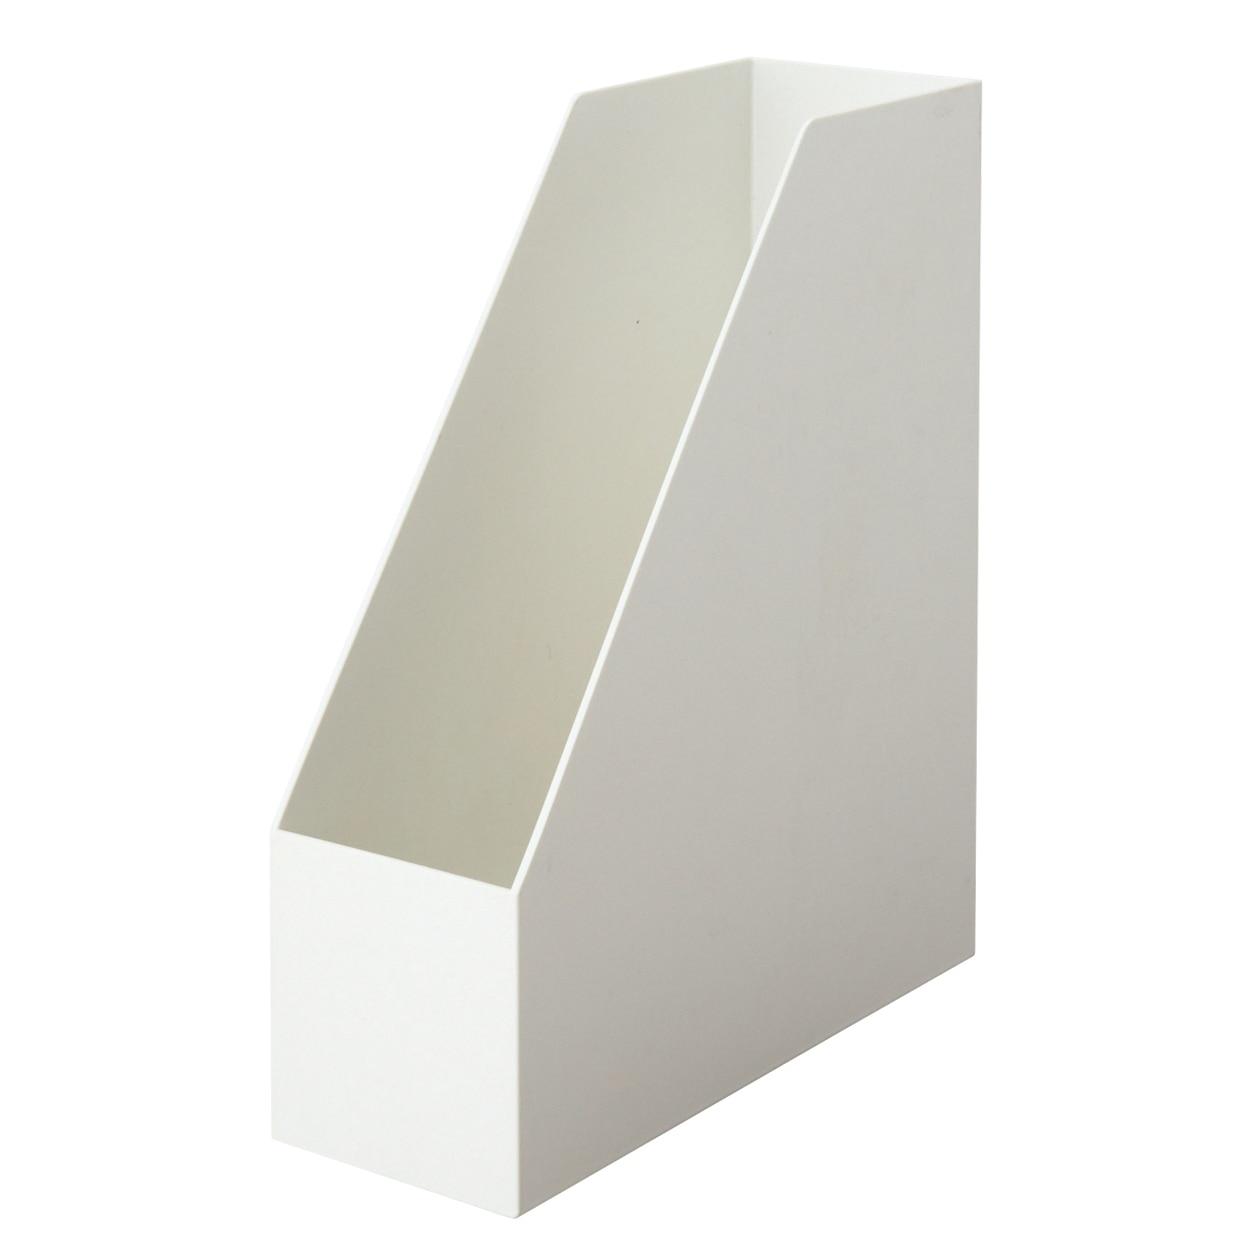 RoomClip商品情報 - ポリプロピレンスタンドファイルボックス・A4用 ホワイトグレー